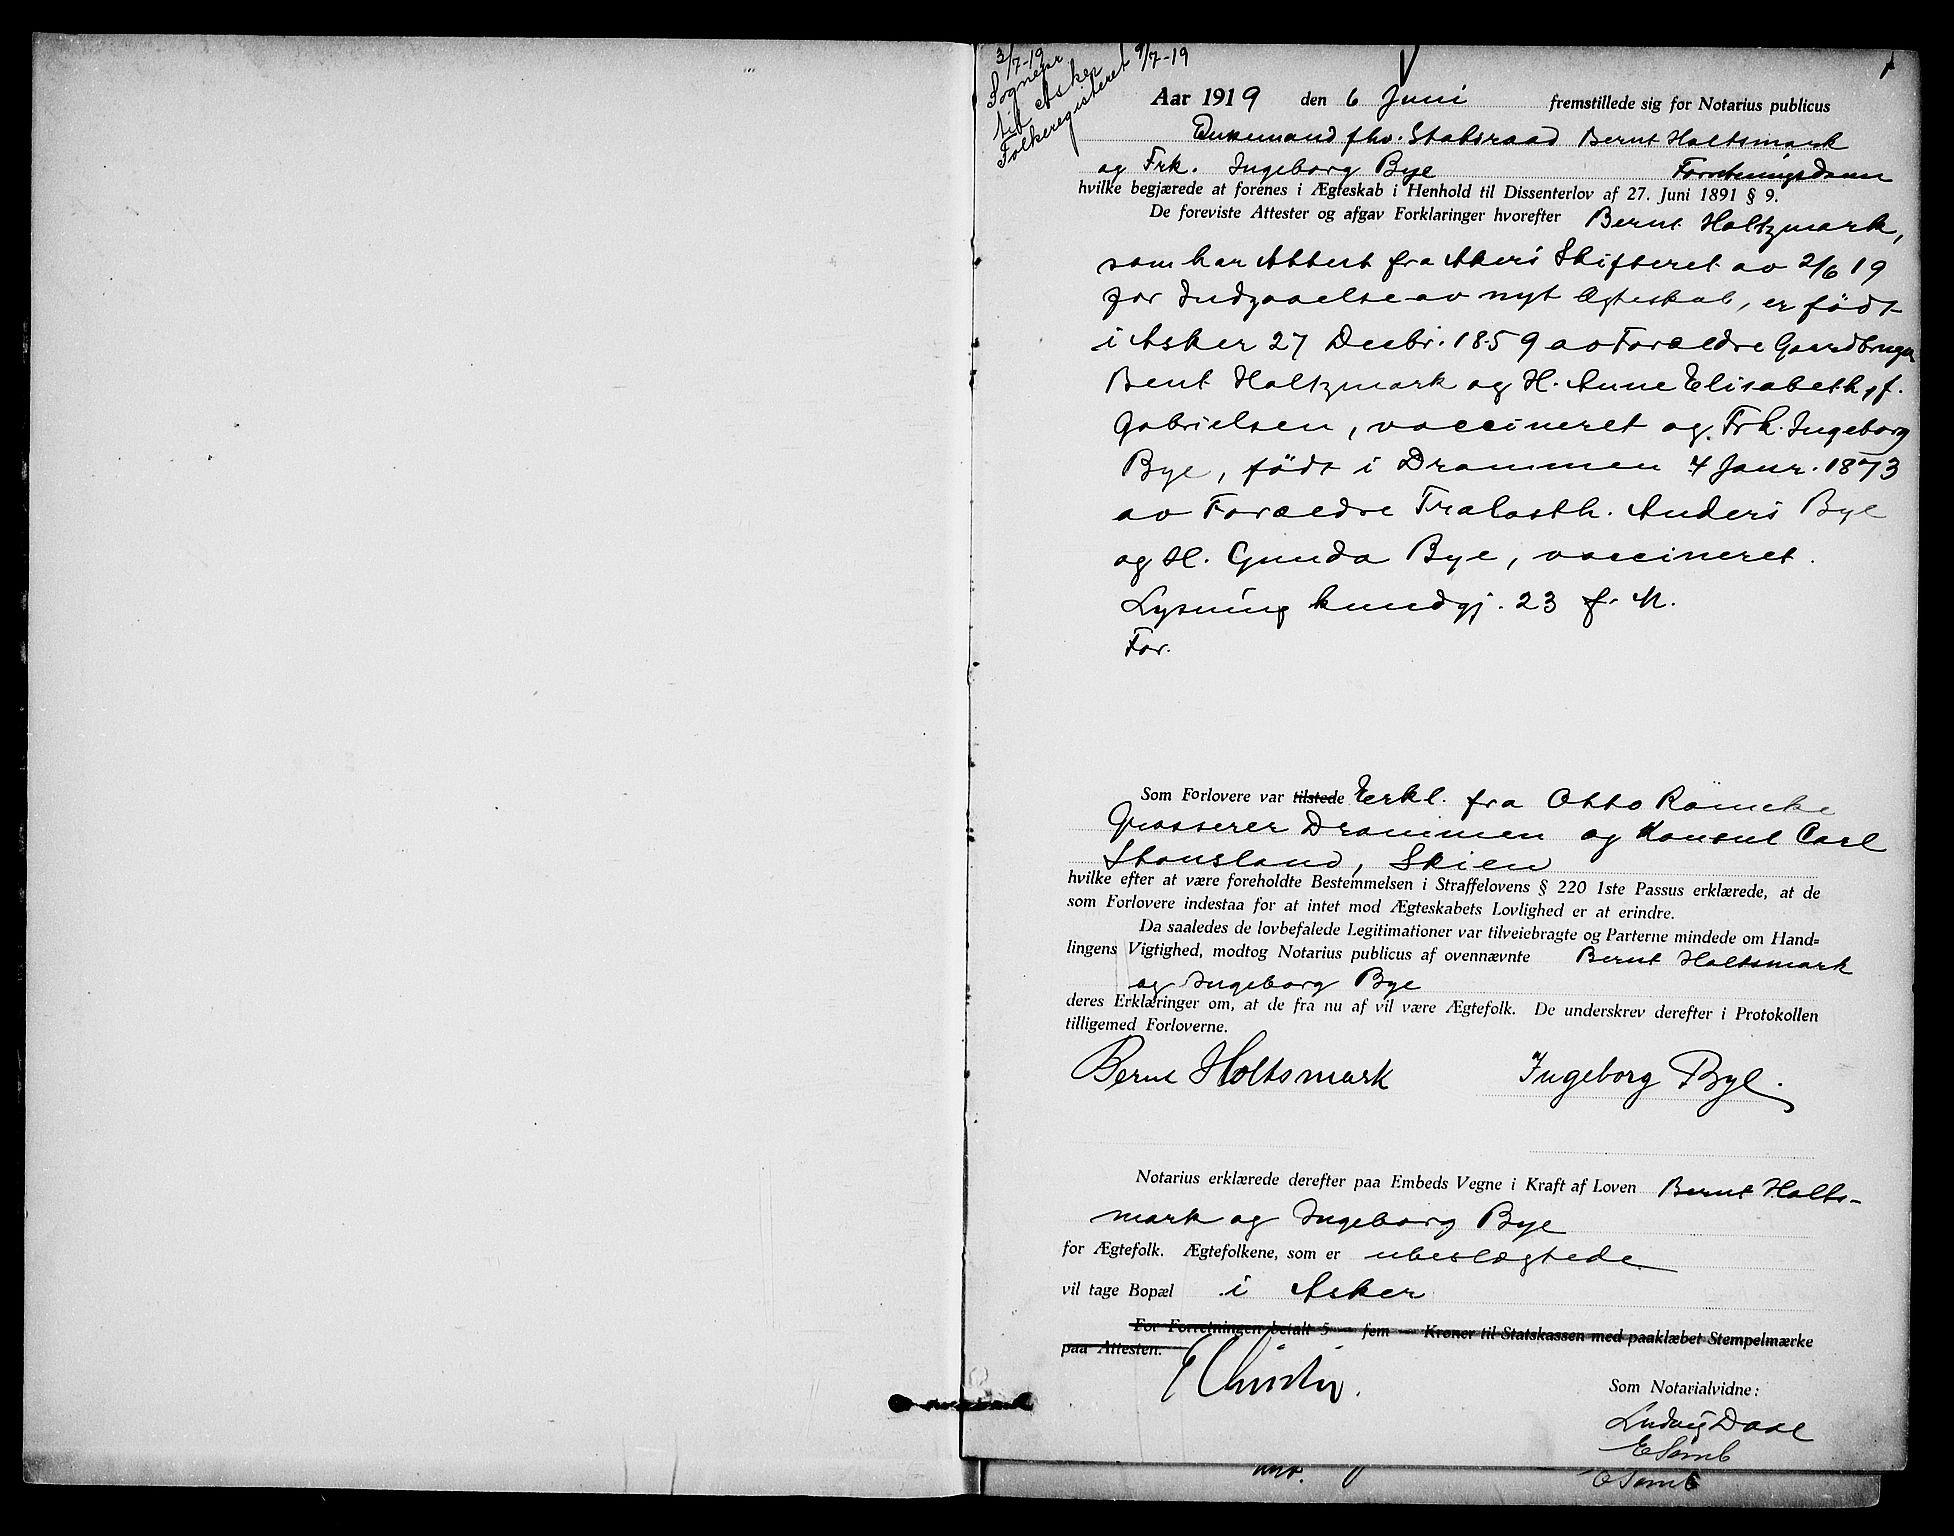 SAO, Oslo byfogd avd. I, L/Lb/Lbb/L0013: Notarialprotokoll, rekke II: Vigsler, 1919-1920, s. 1